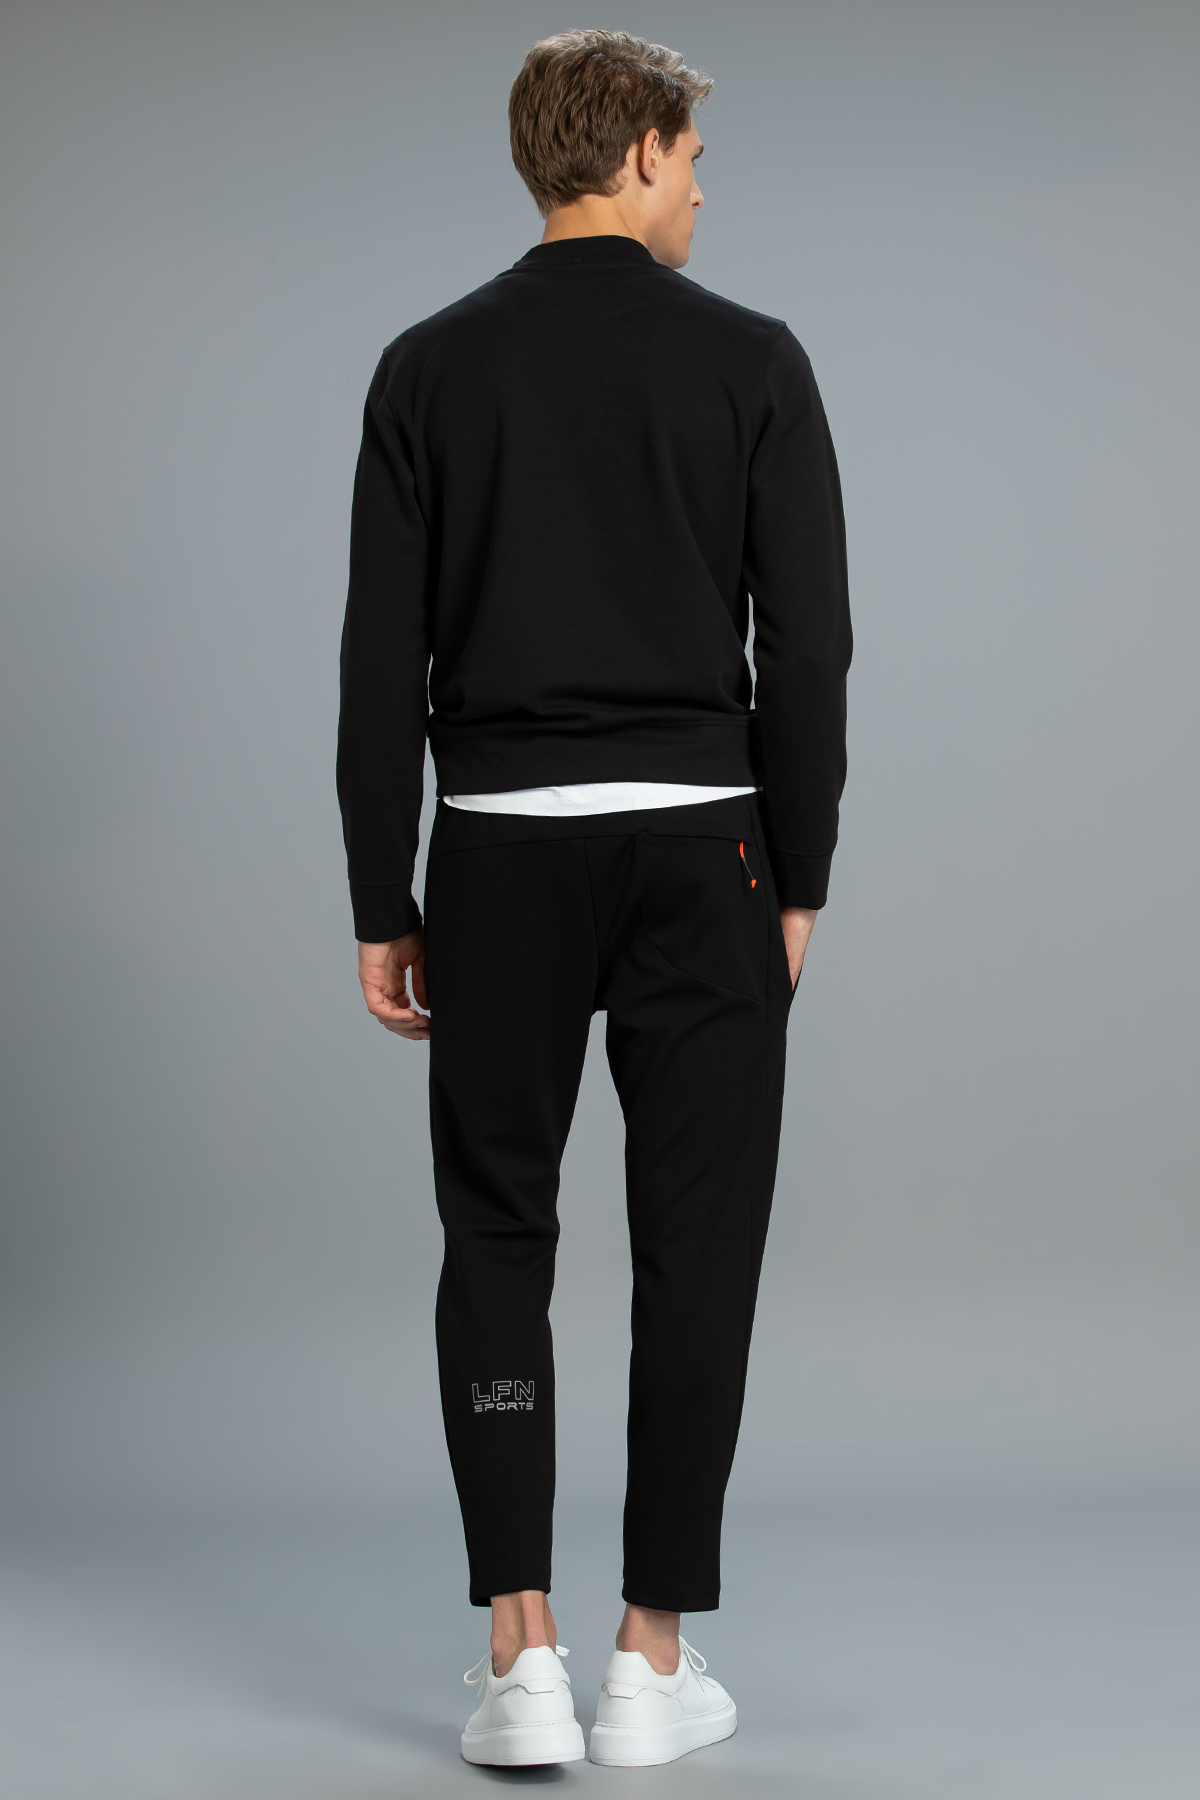 Todillo Erkek Sweatshirt Siyah